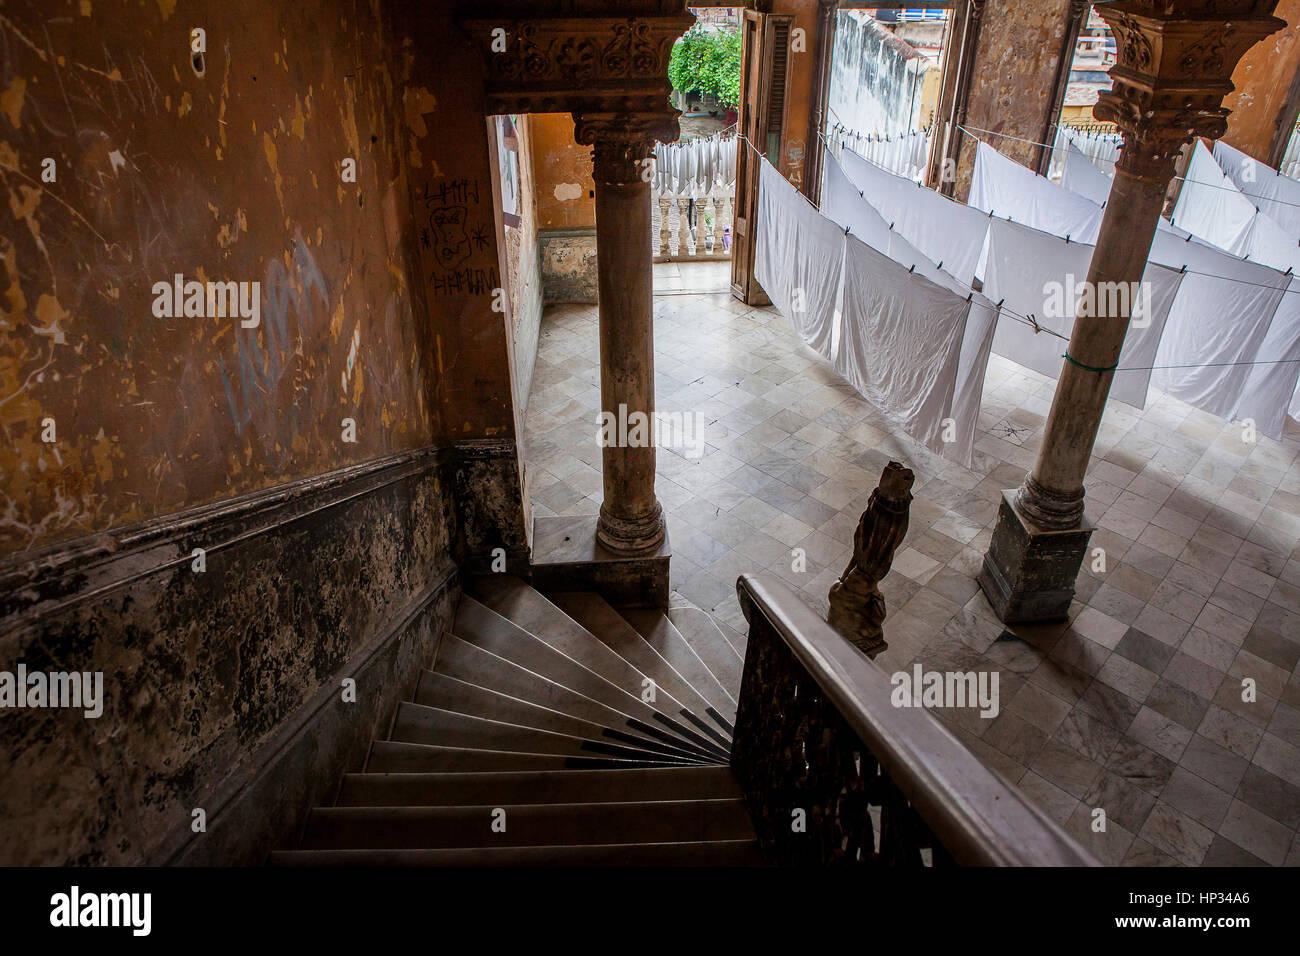 Entrance to the restaurant Paladar La Guarida, Centro Habana district, Cuba - Stock Image